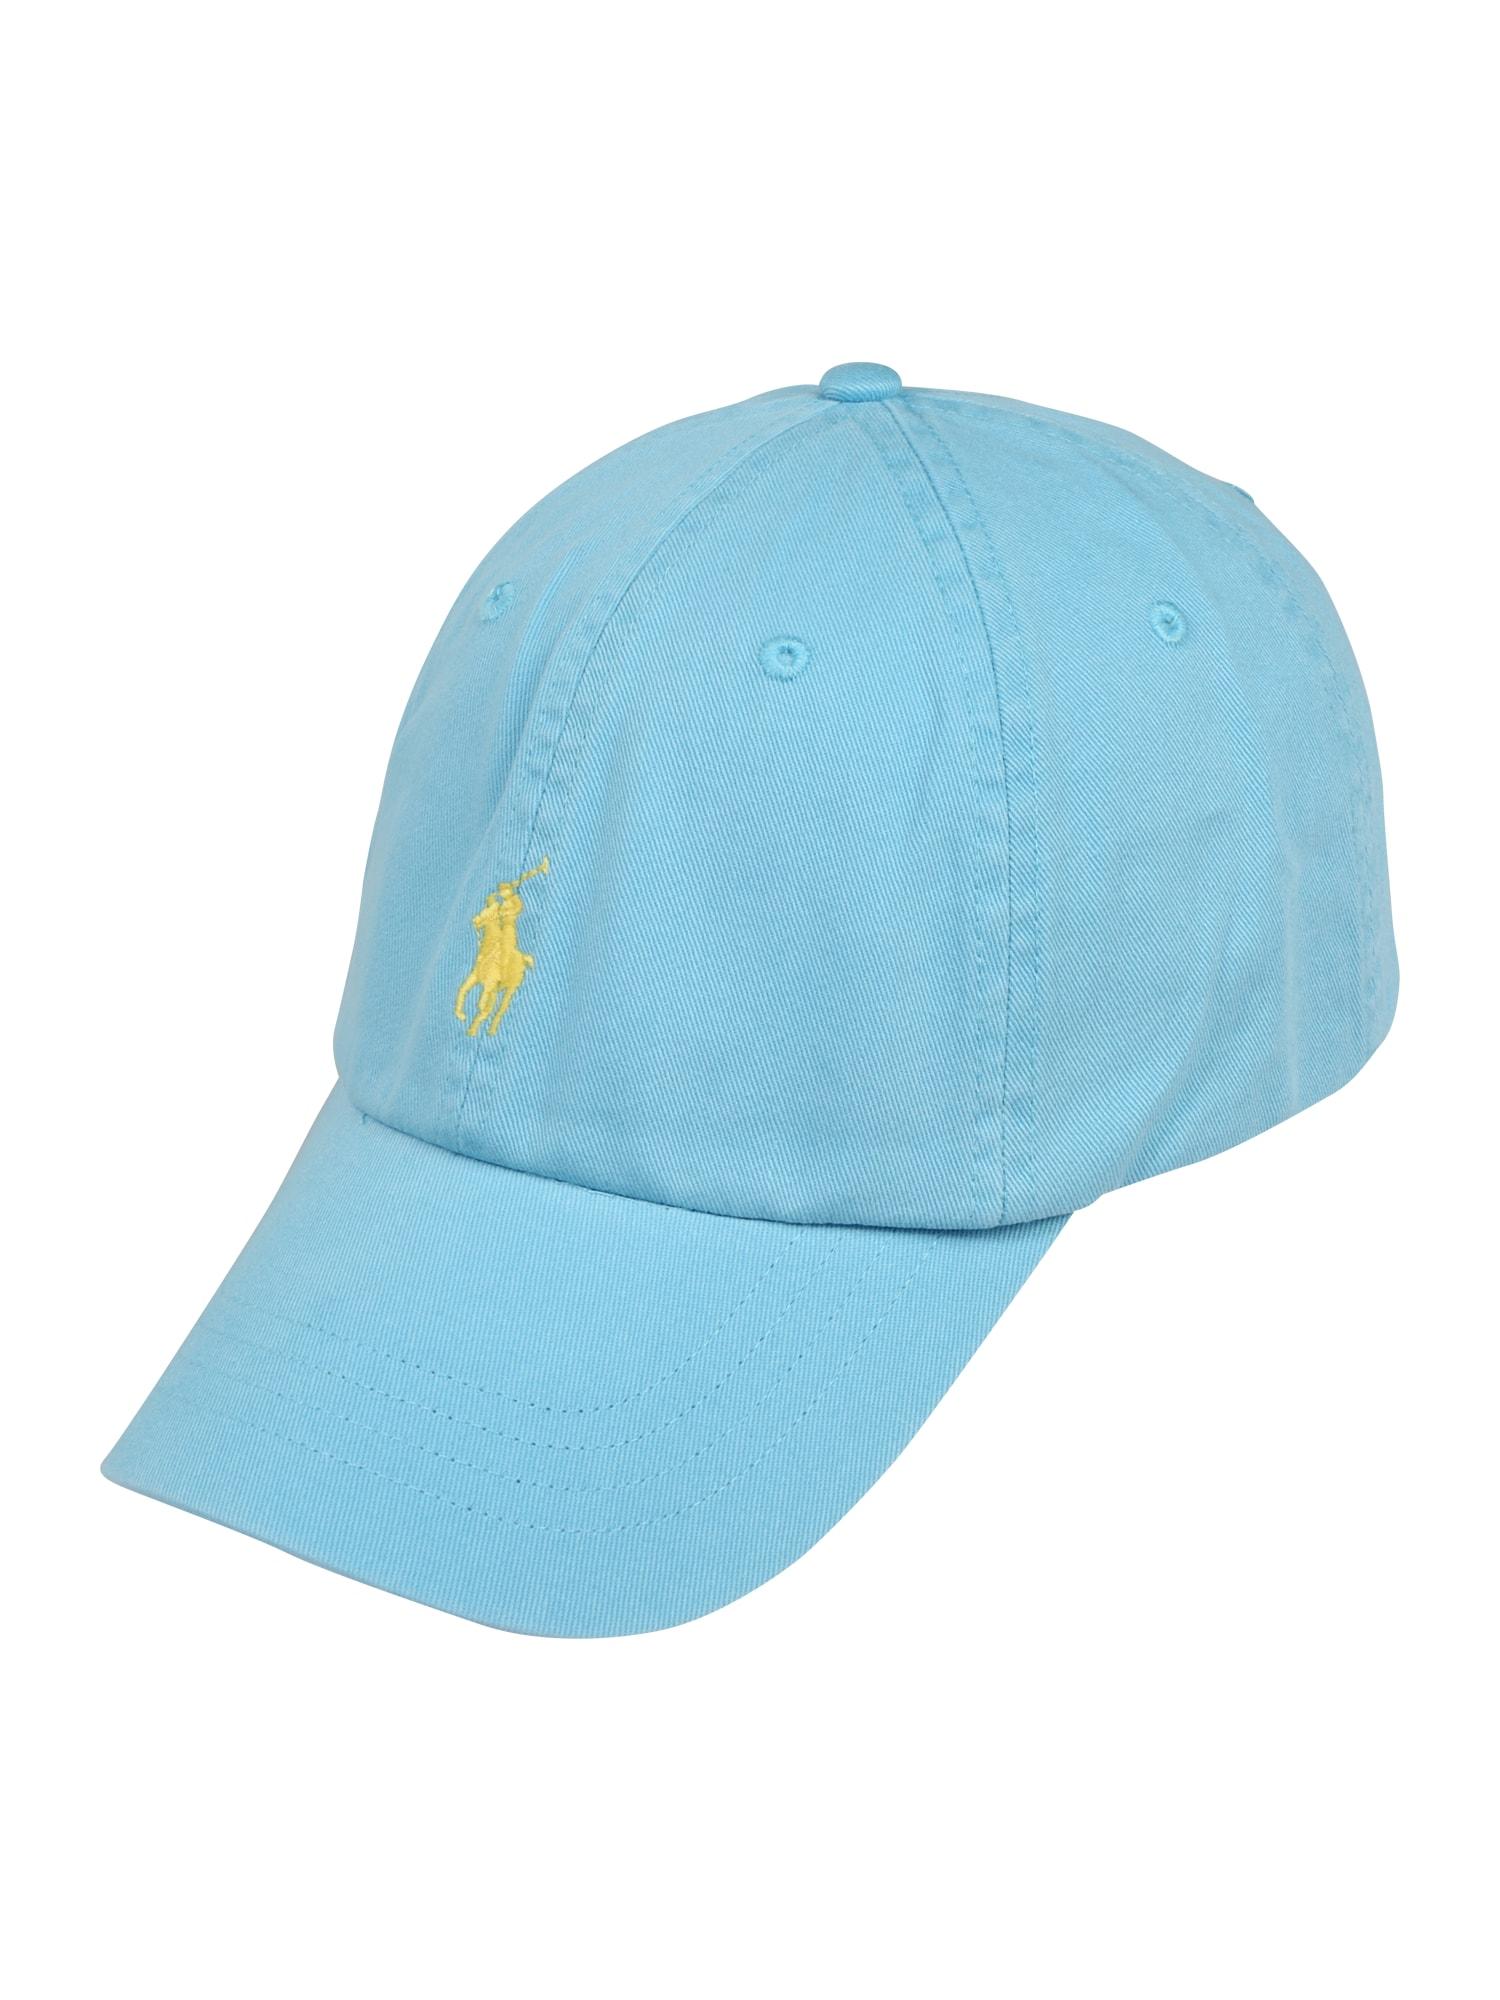 POLO RALPH LAUREN Kepurė geltona / šviesiai mėlyna